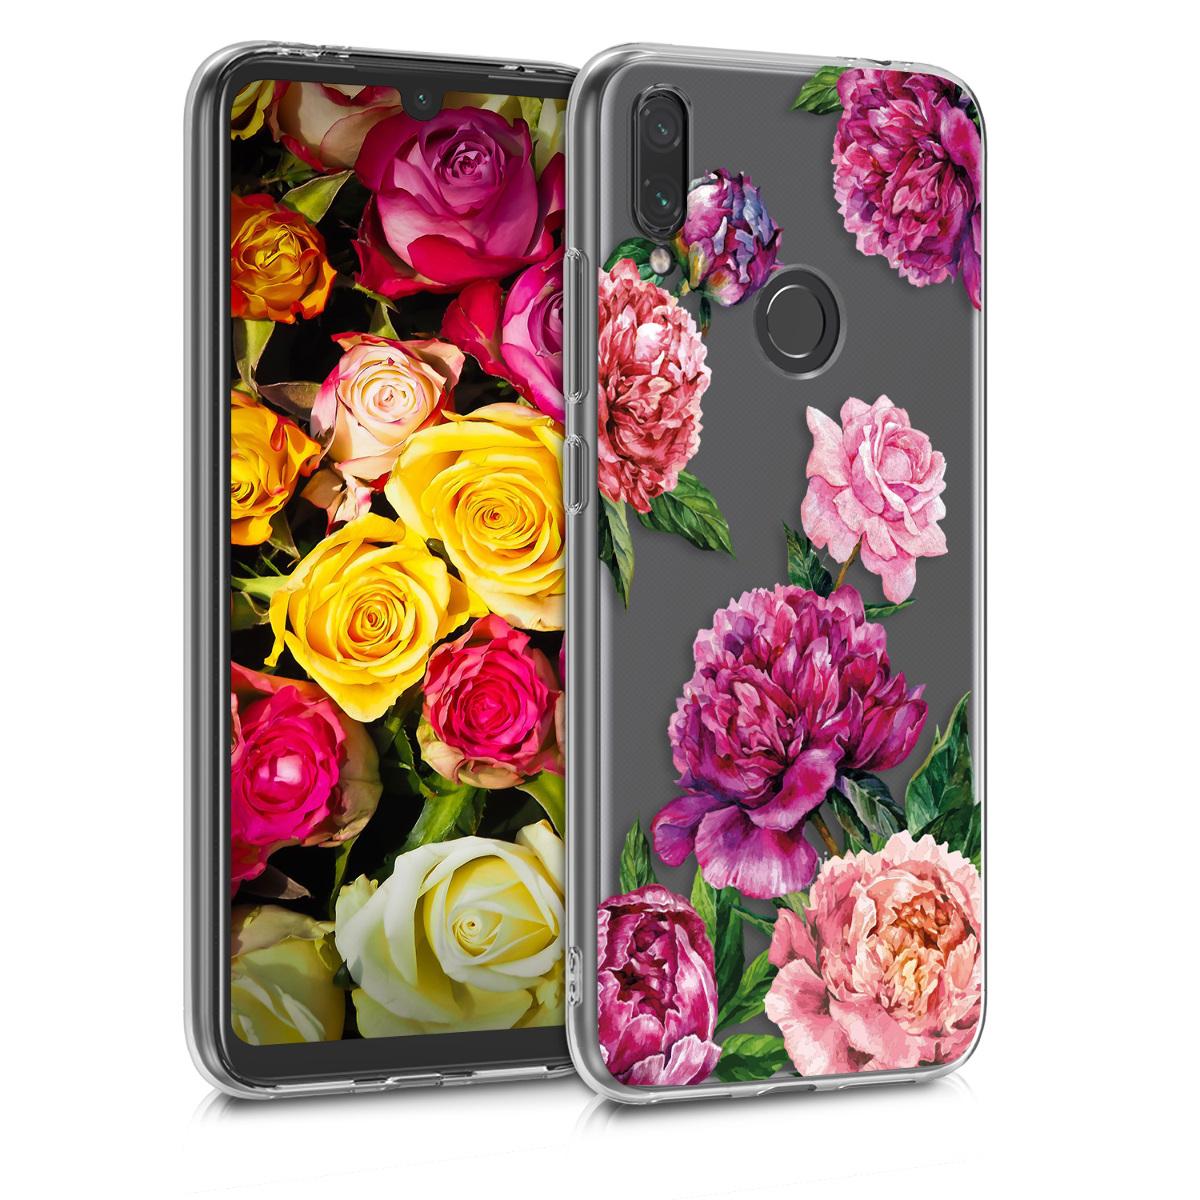 KW Θήκη Σιλικόνης Xiaomi Redmi Note 7 / Note 7 Pro - Violet / Light Pink / Transparent (48156.08)